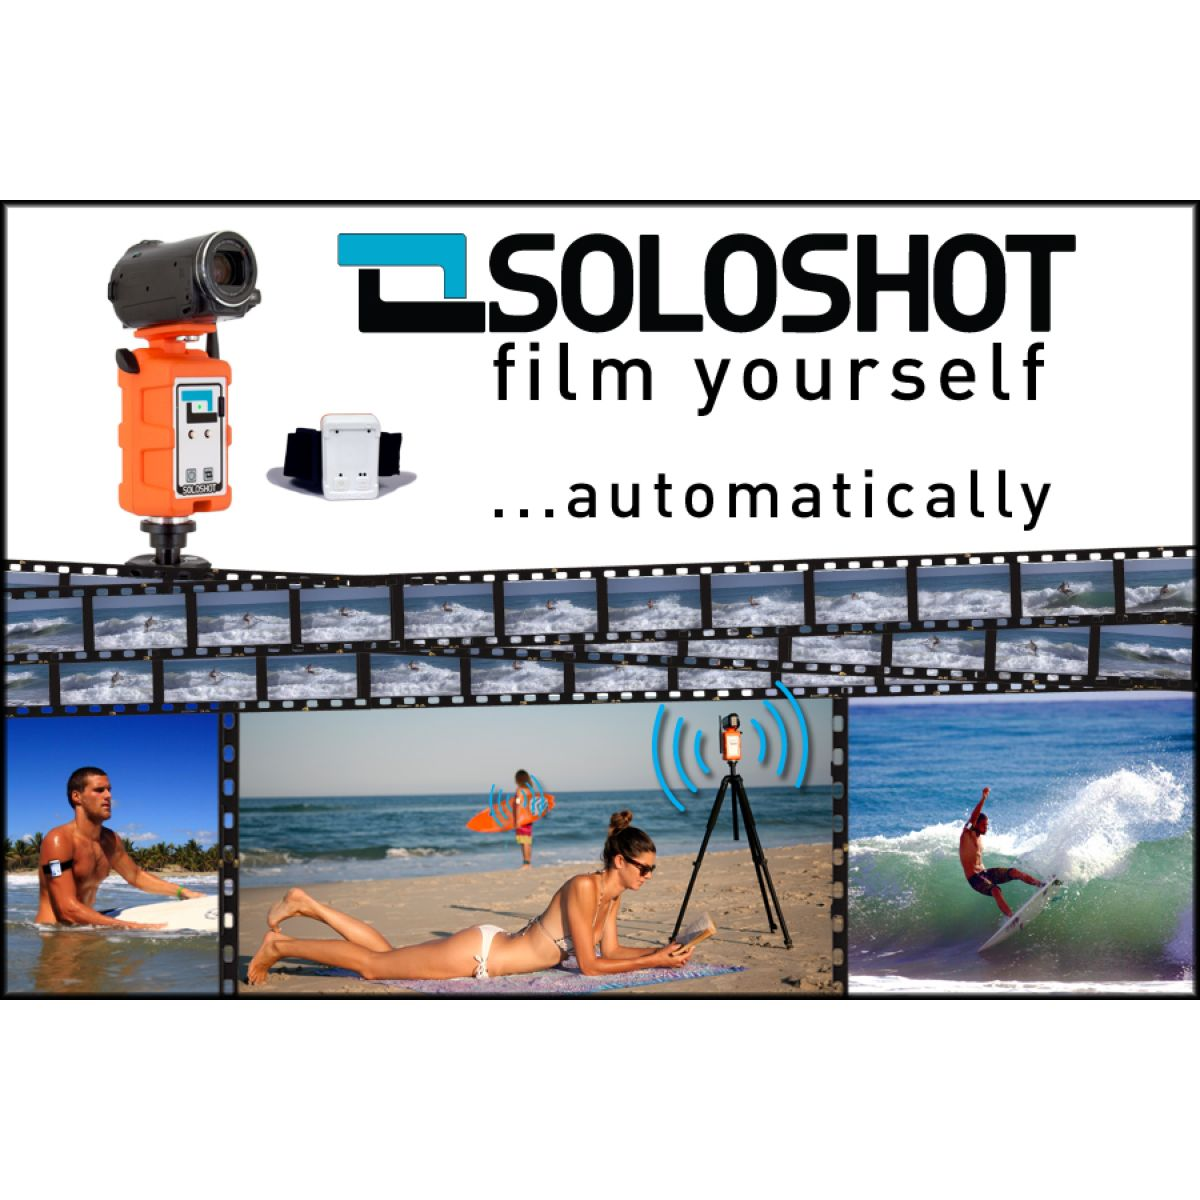 SOLOSHOT2: http://goo.gl/UX8W03, #SoloShot2 #Soloshot #filmyourself #robotcamera #robotcameraman #videopic.twitter.com/RaZZONVBPK